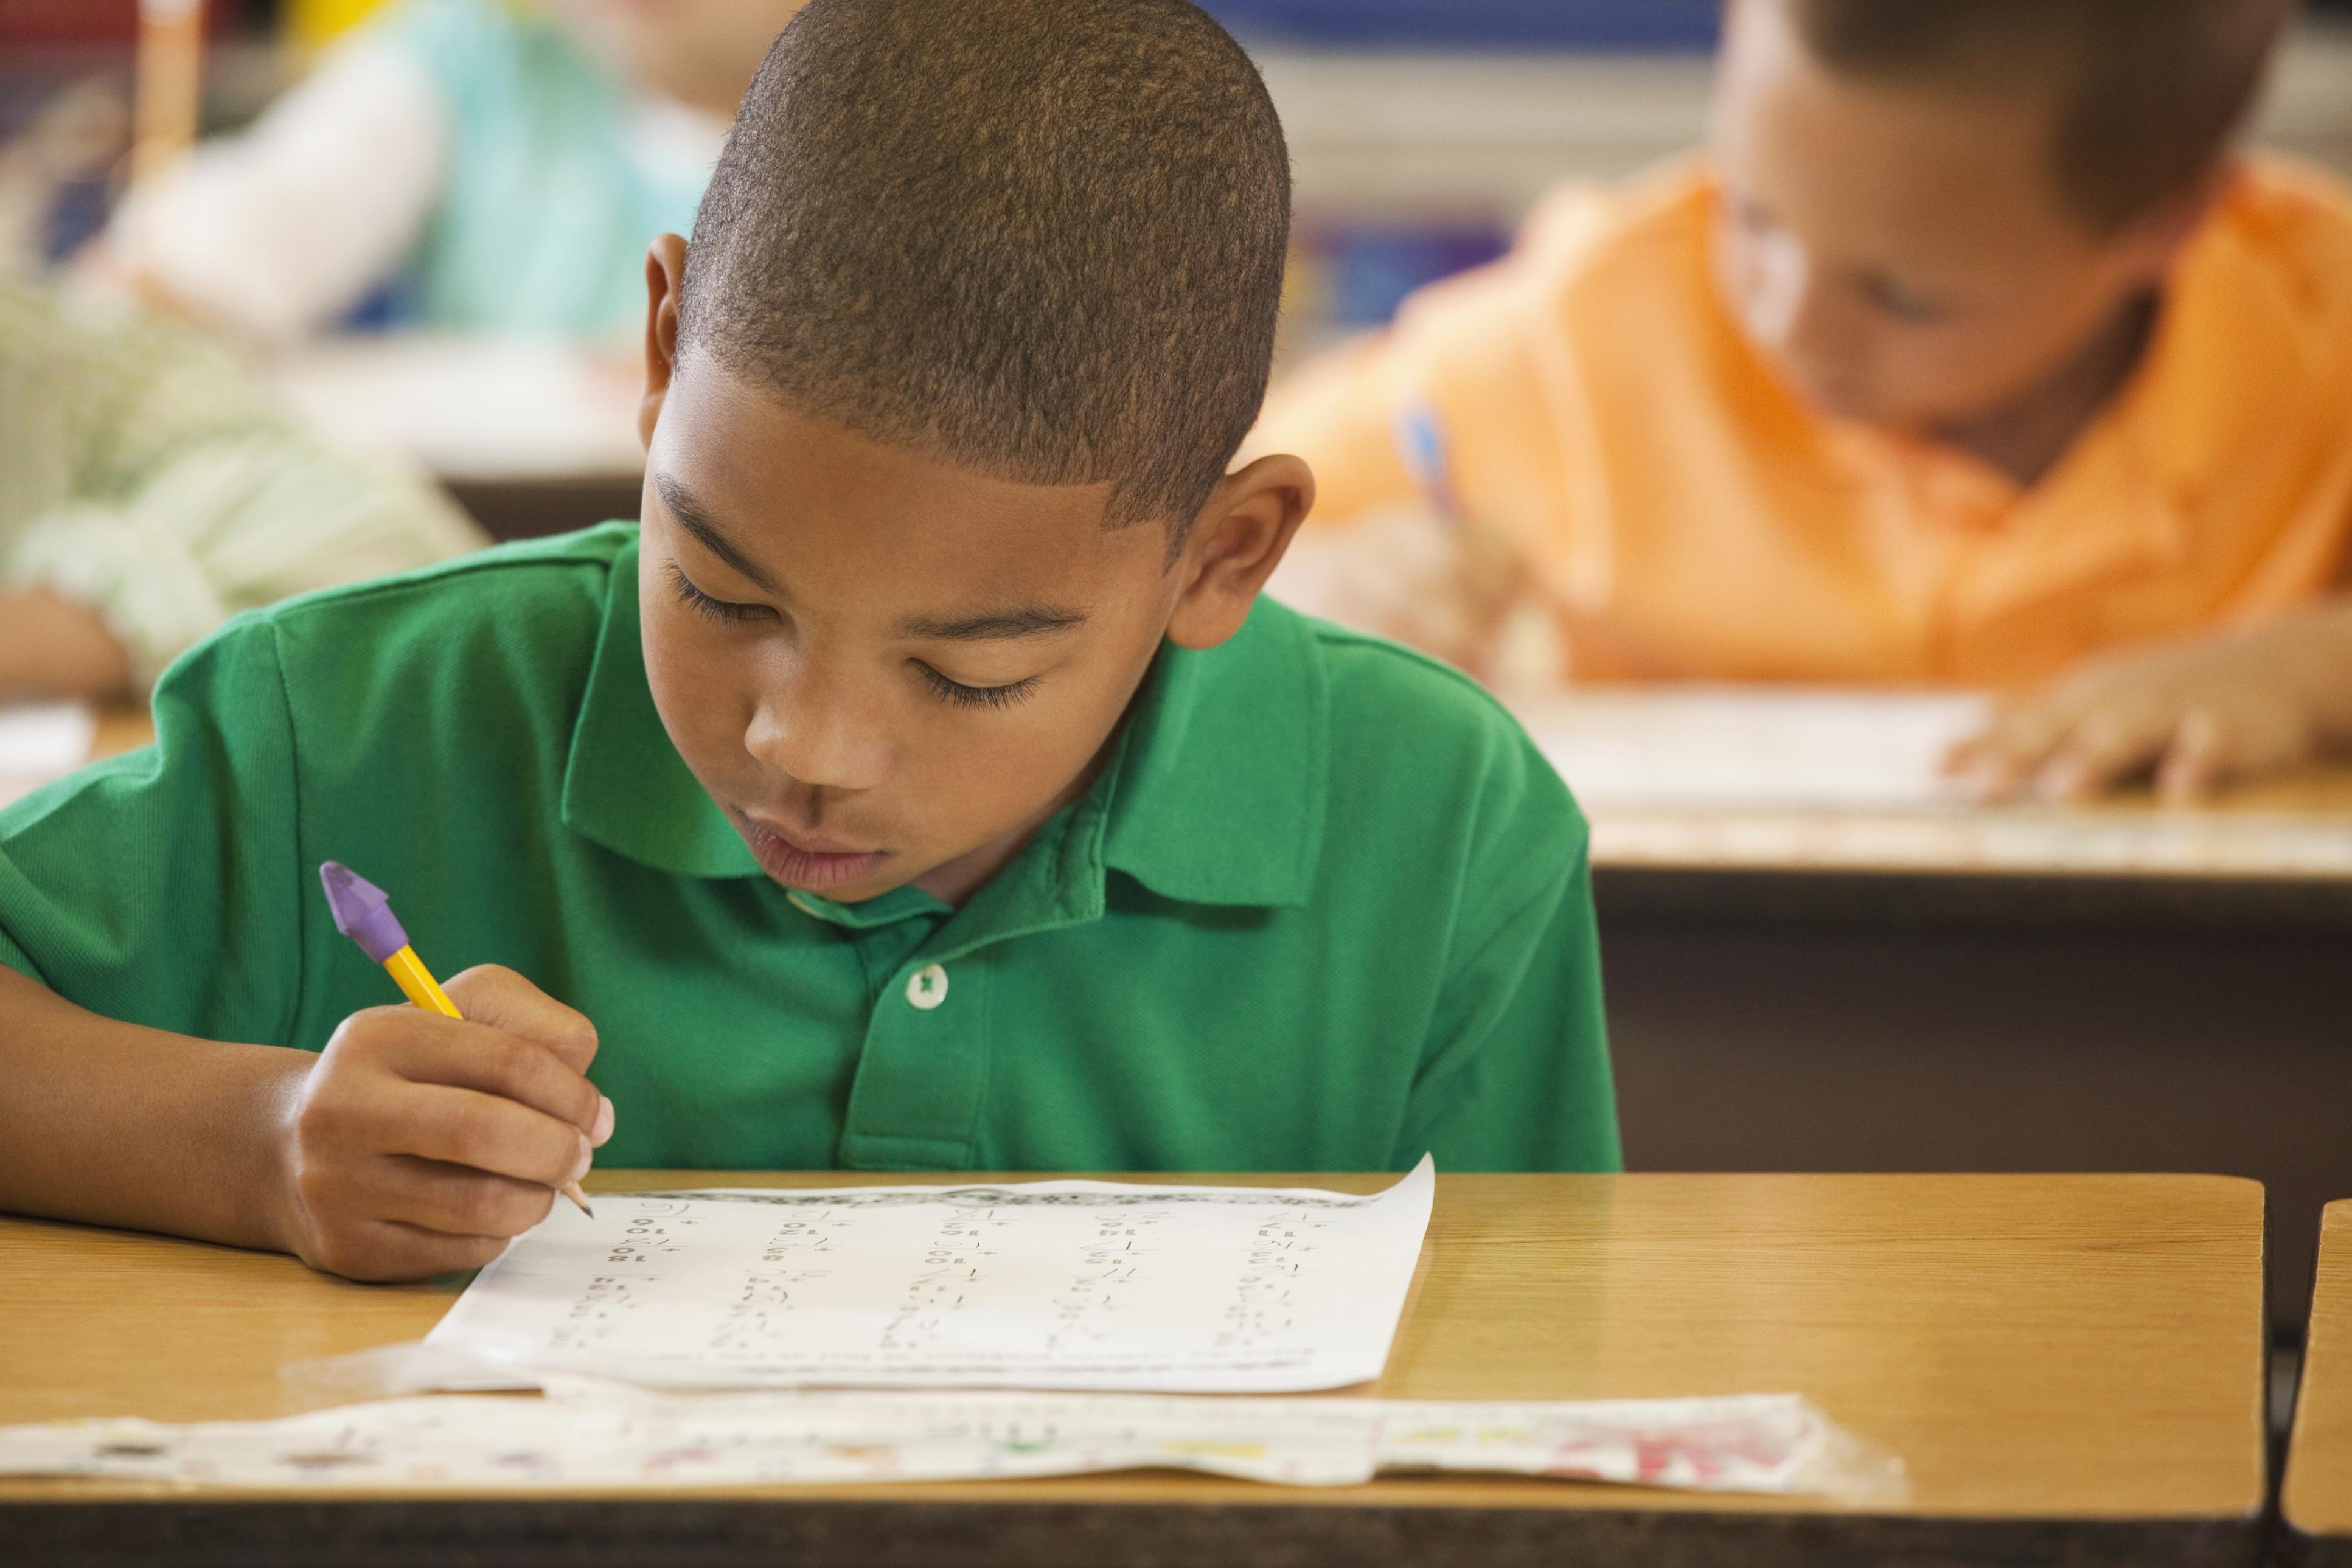 School Kid Test Answers